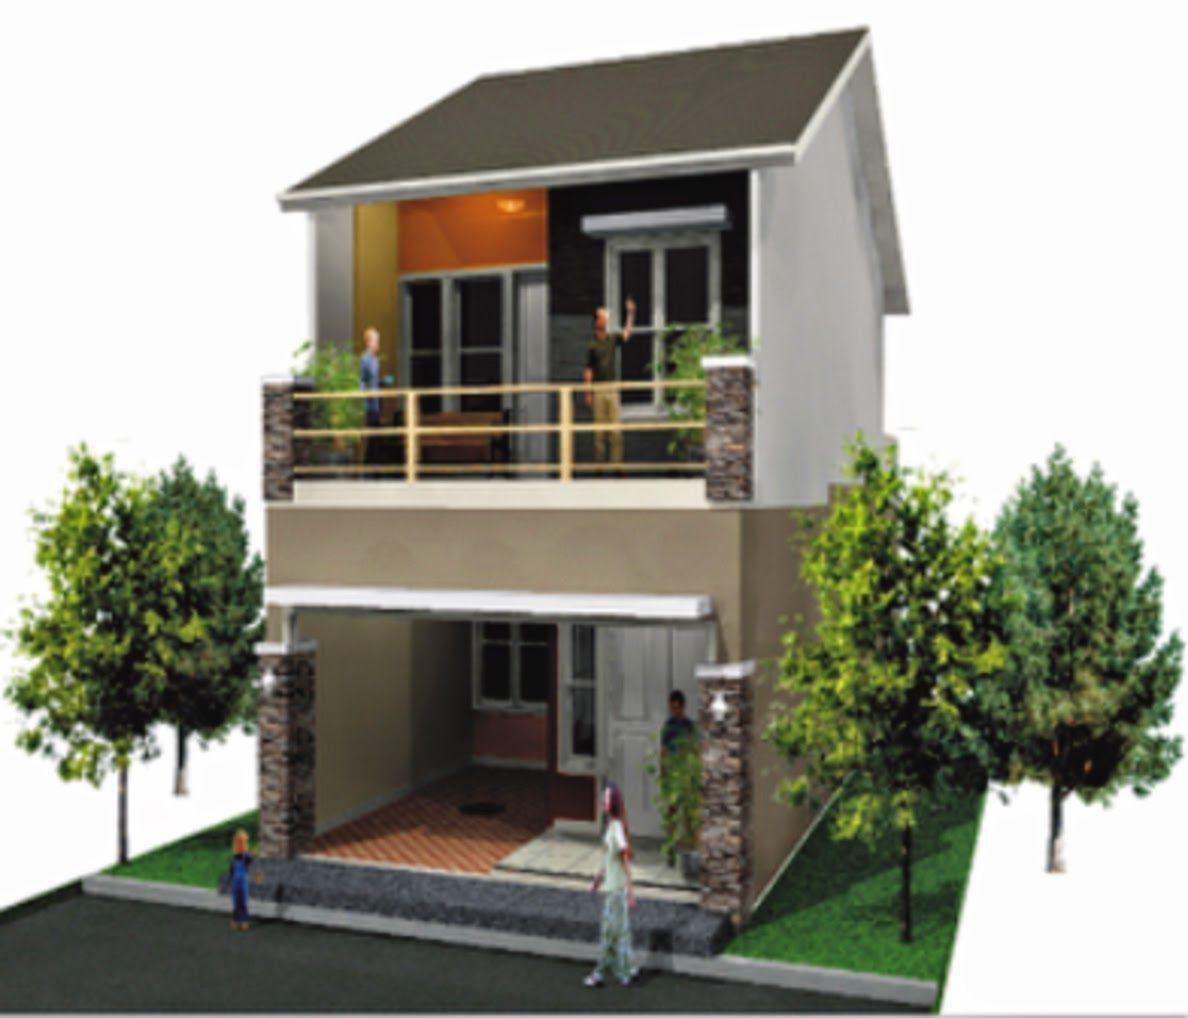 Desain Rumah Minimalis Modern Type 36 2 Lantai | Huniankini